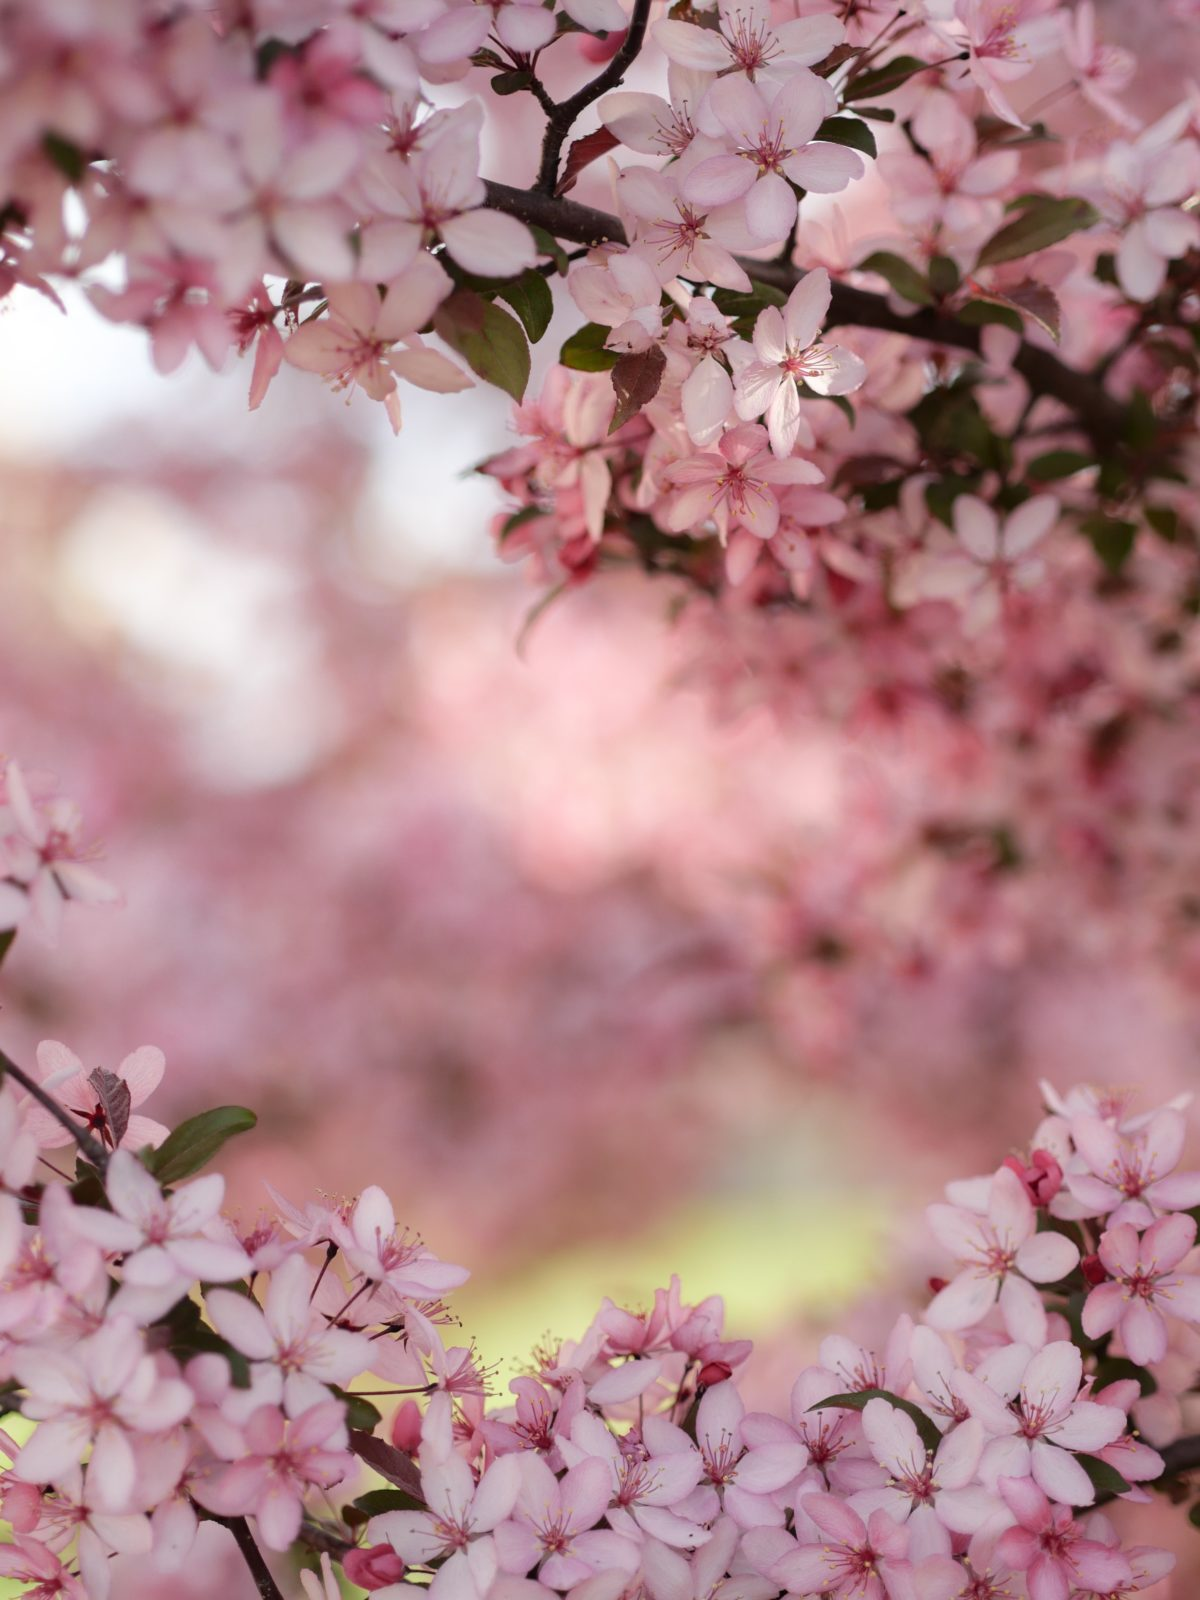 Photo by Aaron Burden さんのお花の作品です